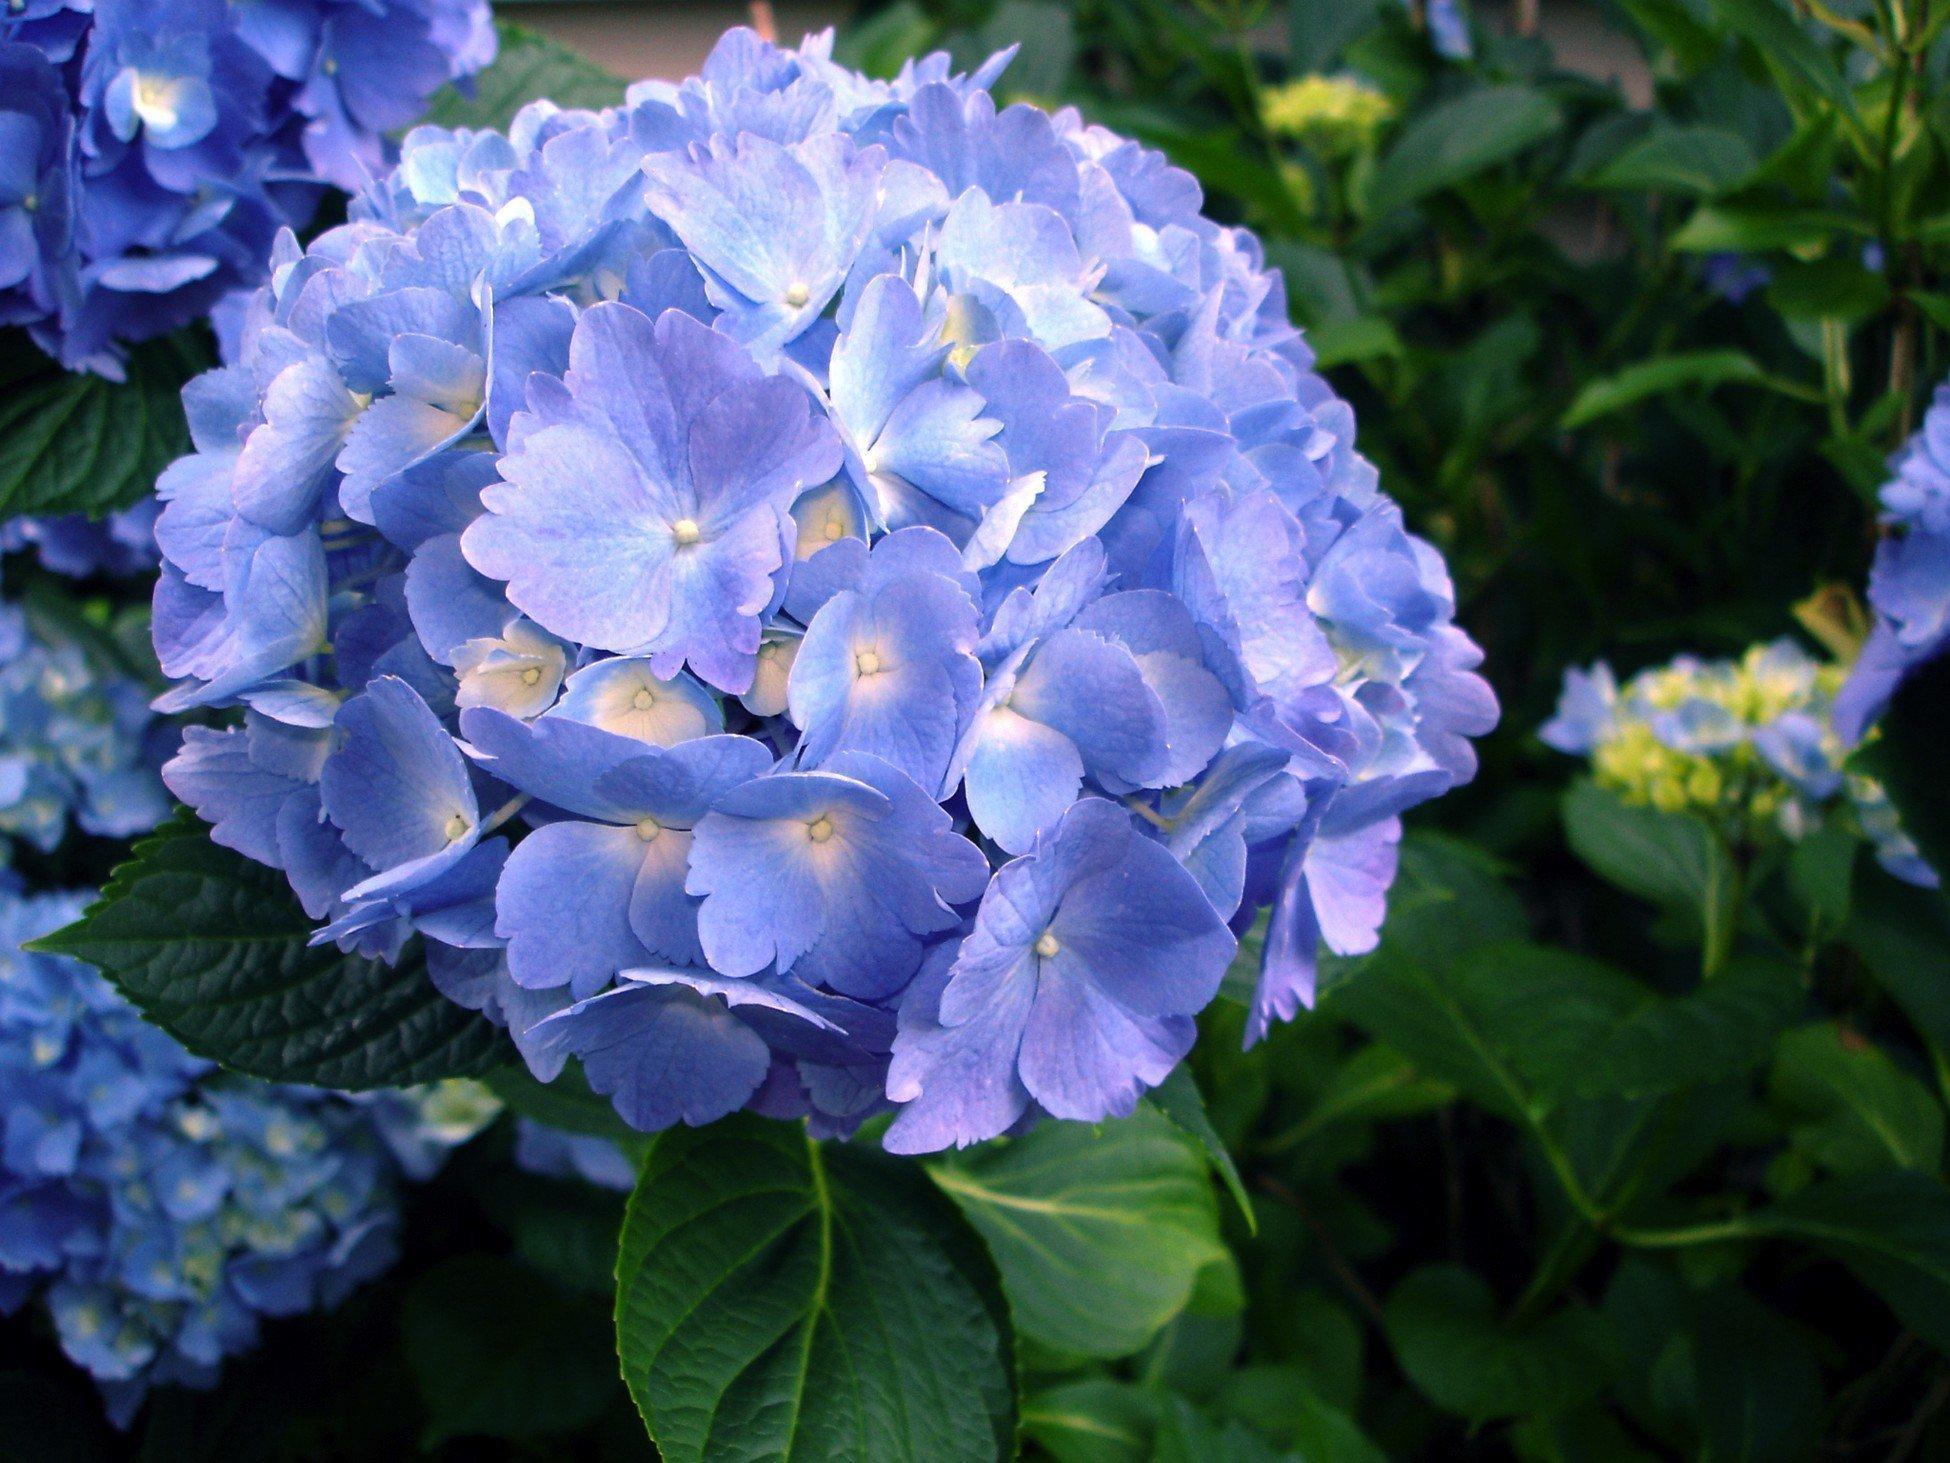 Gardening Tips For Pruning Hydrangea Bushes The Morning